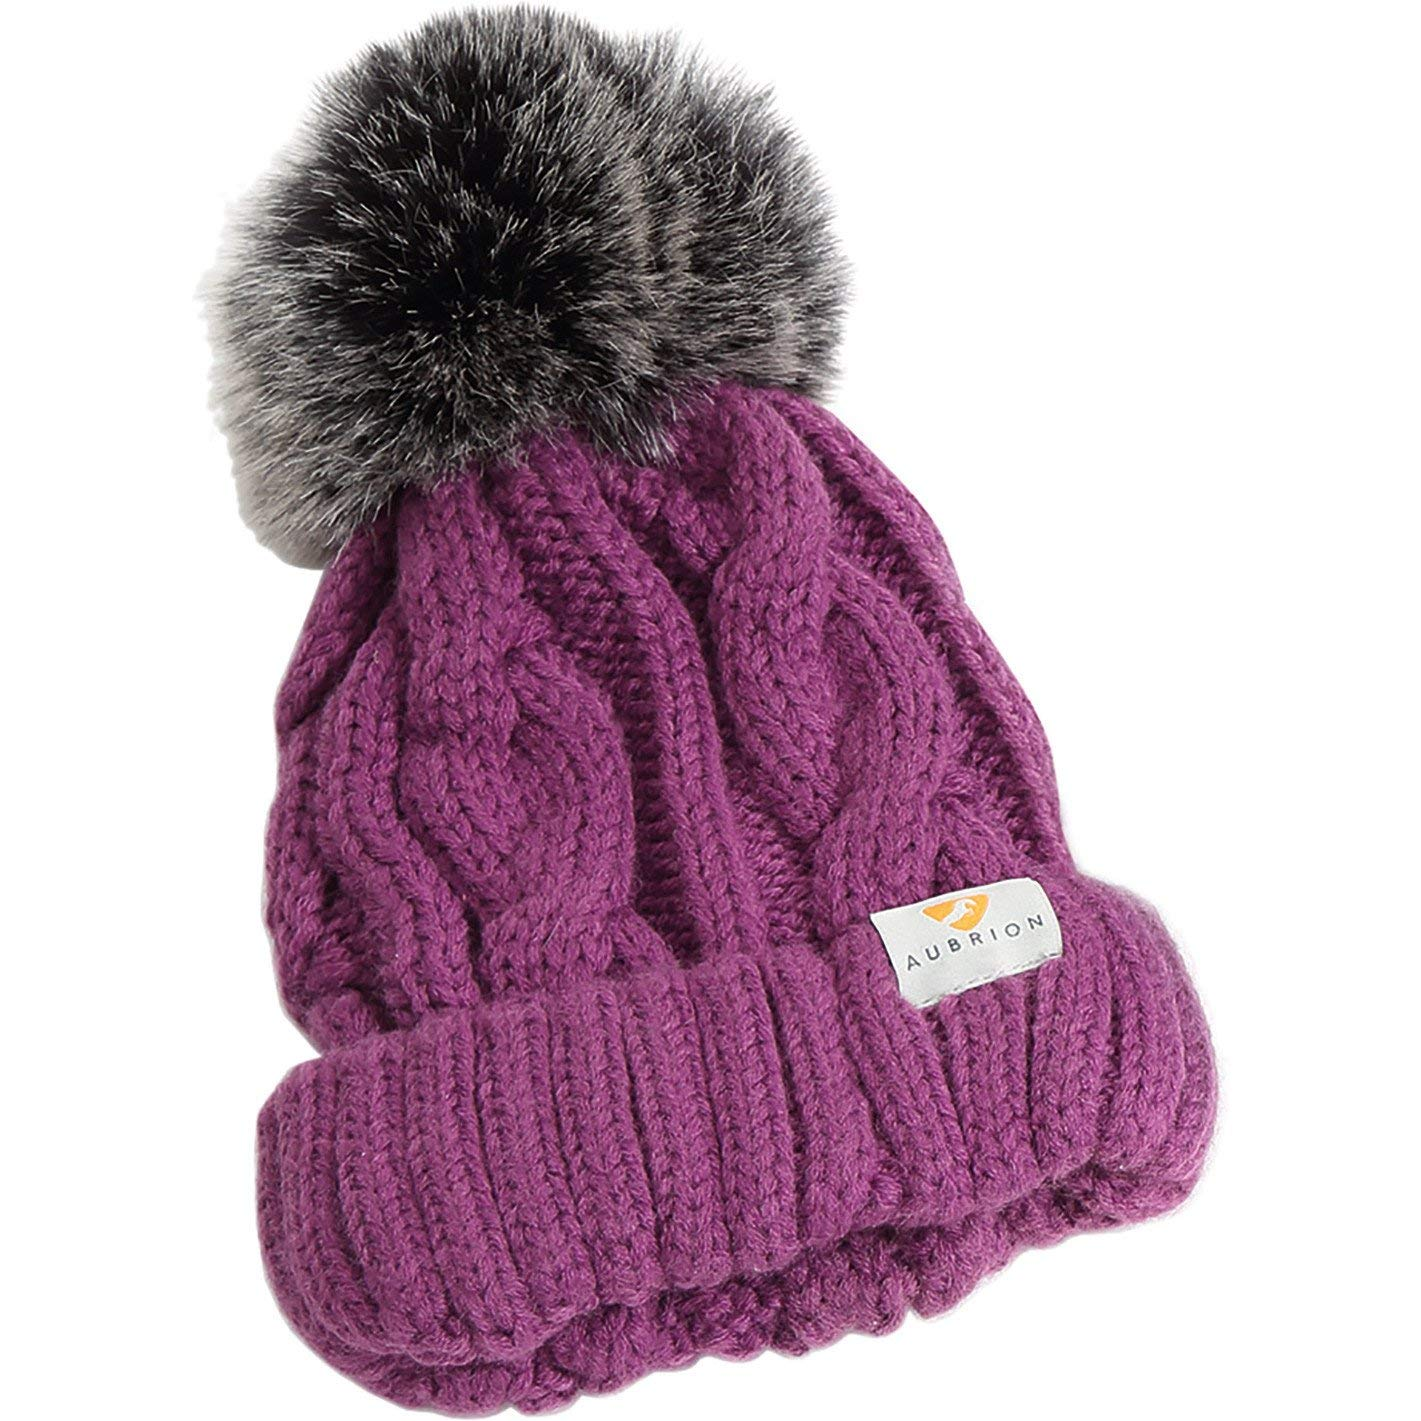 Shires AUBRION Indiana Pom Pom Hat - Ladies